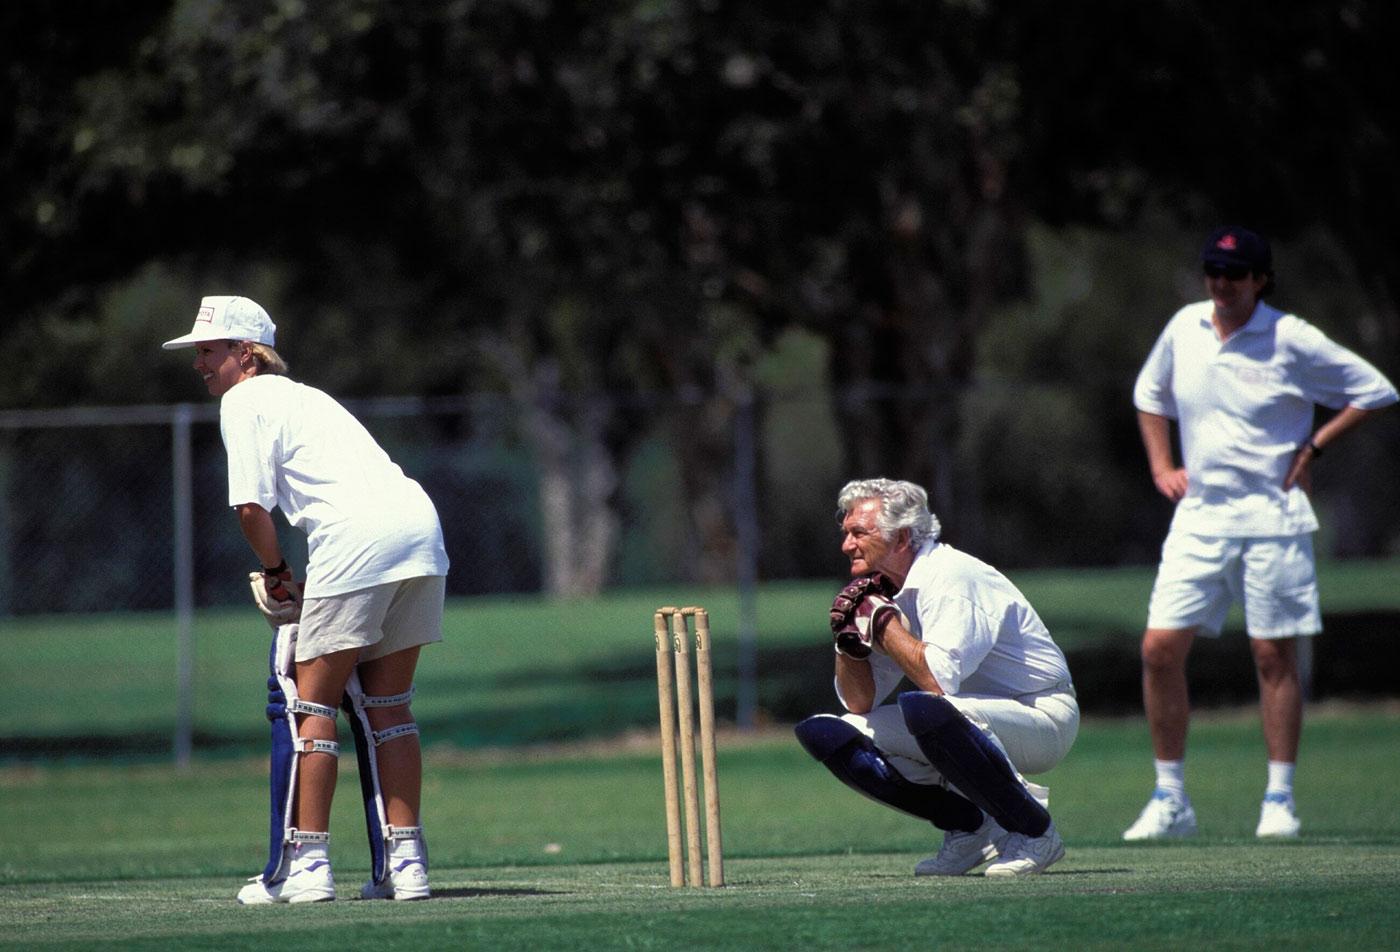 The cricket tragic who bowled Bradman